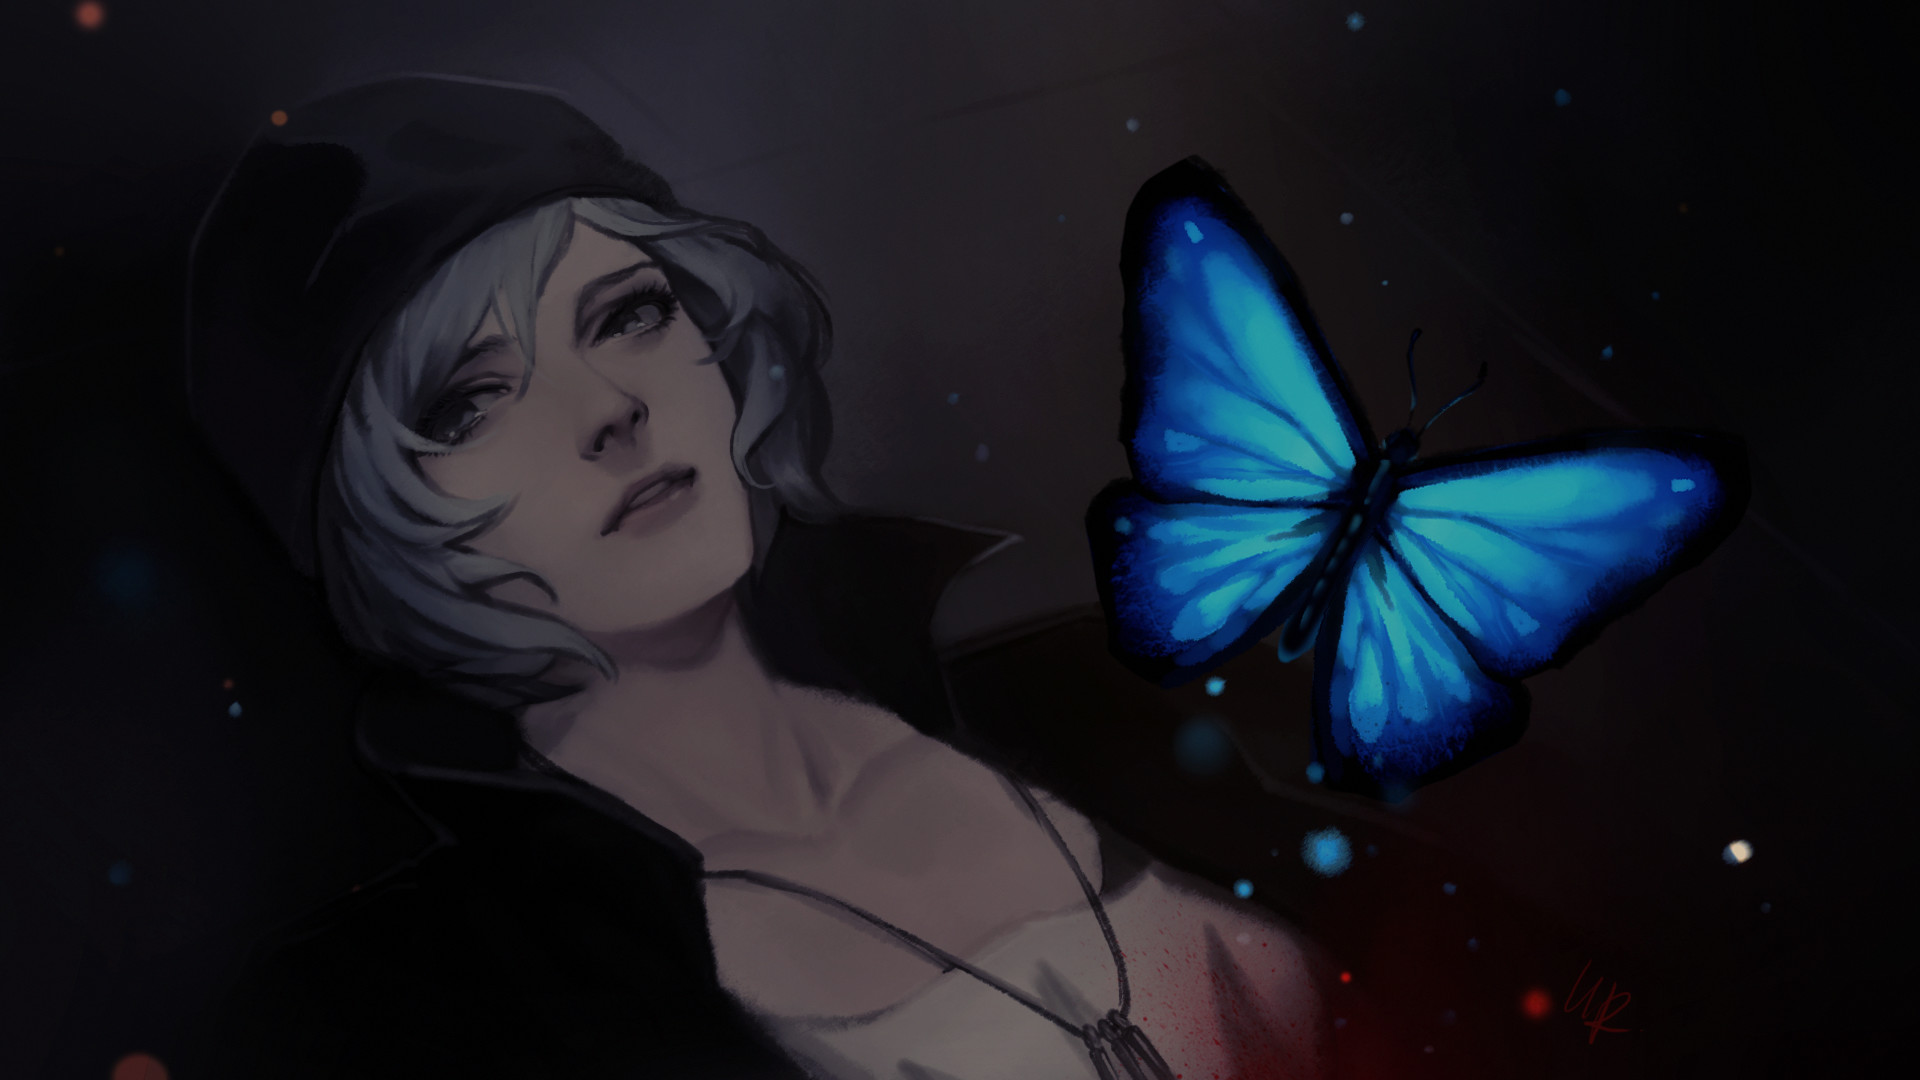 Res: 1920x1080,  - life is strange, chloe price, blue butterfly, artwork #  original resolution